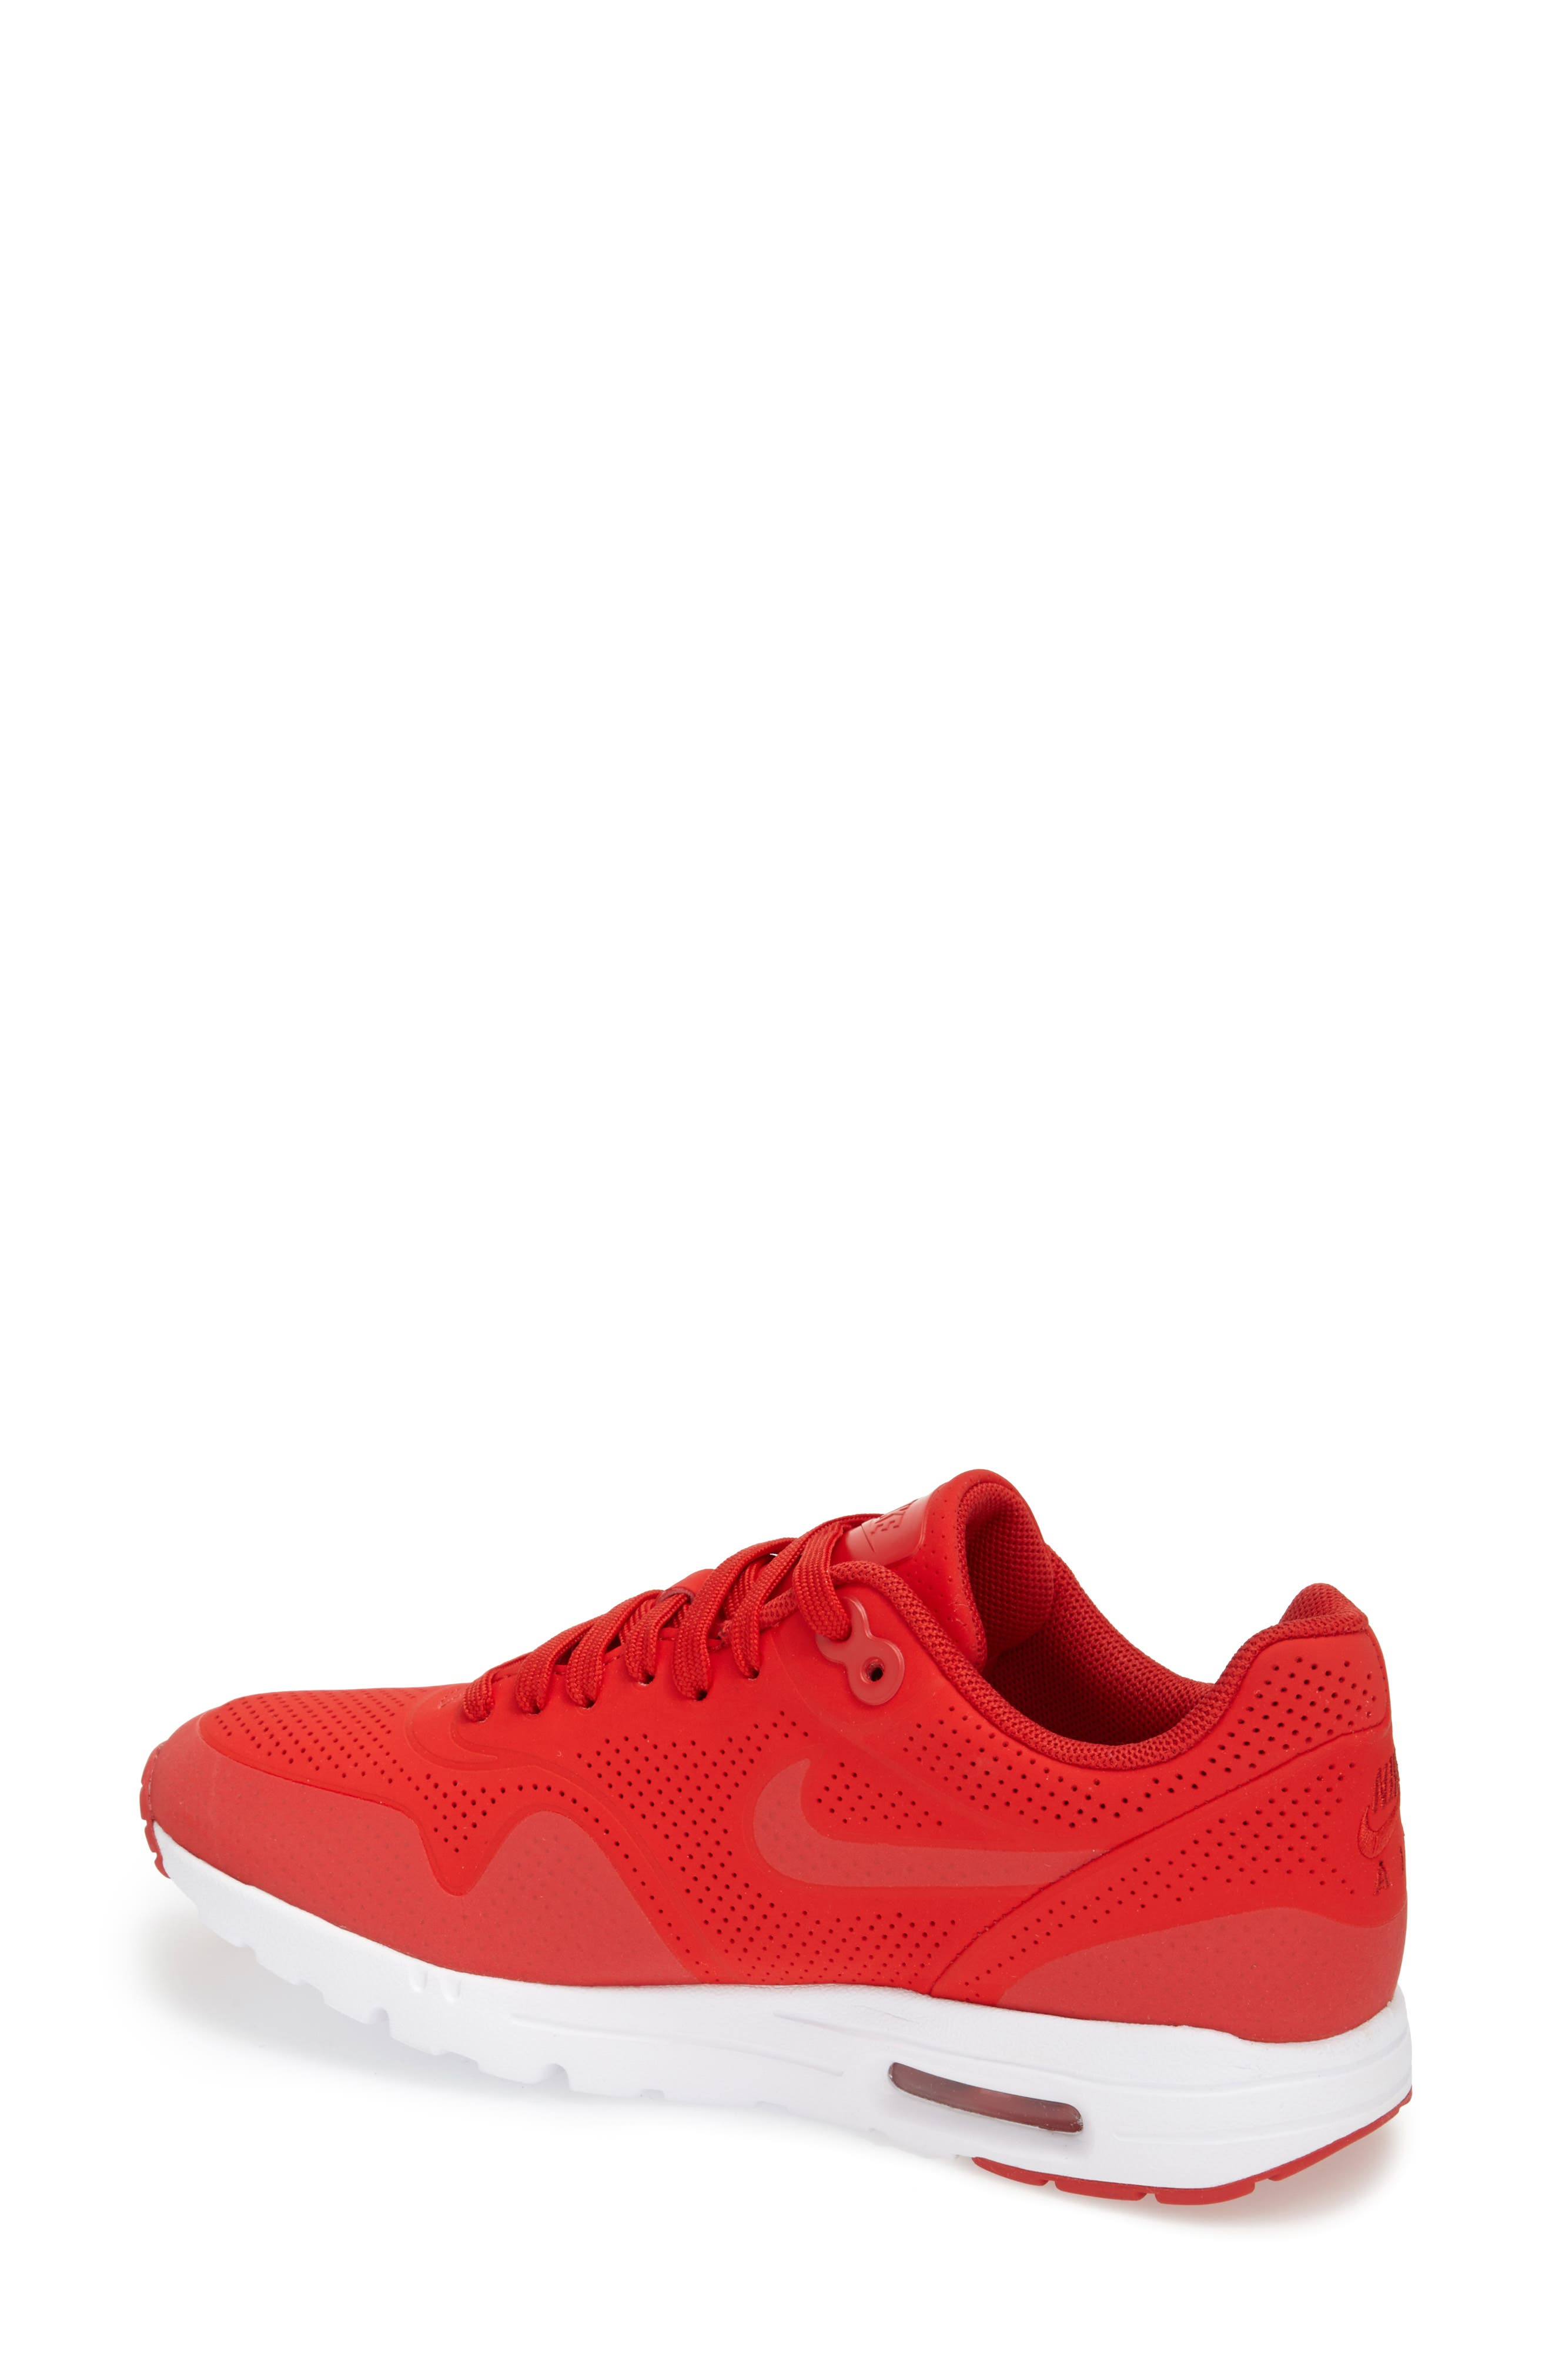 ,                             'Air Max 1 - Ultra Moire' Sneaker,                             Alternate thumbnail 103, color,                             600